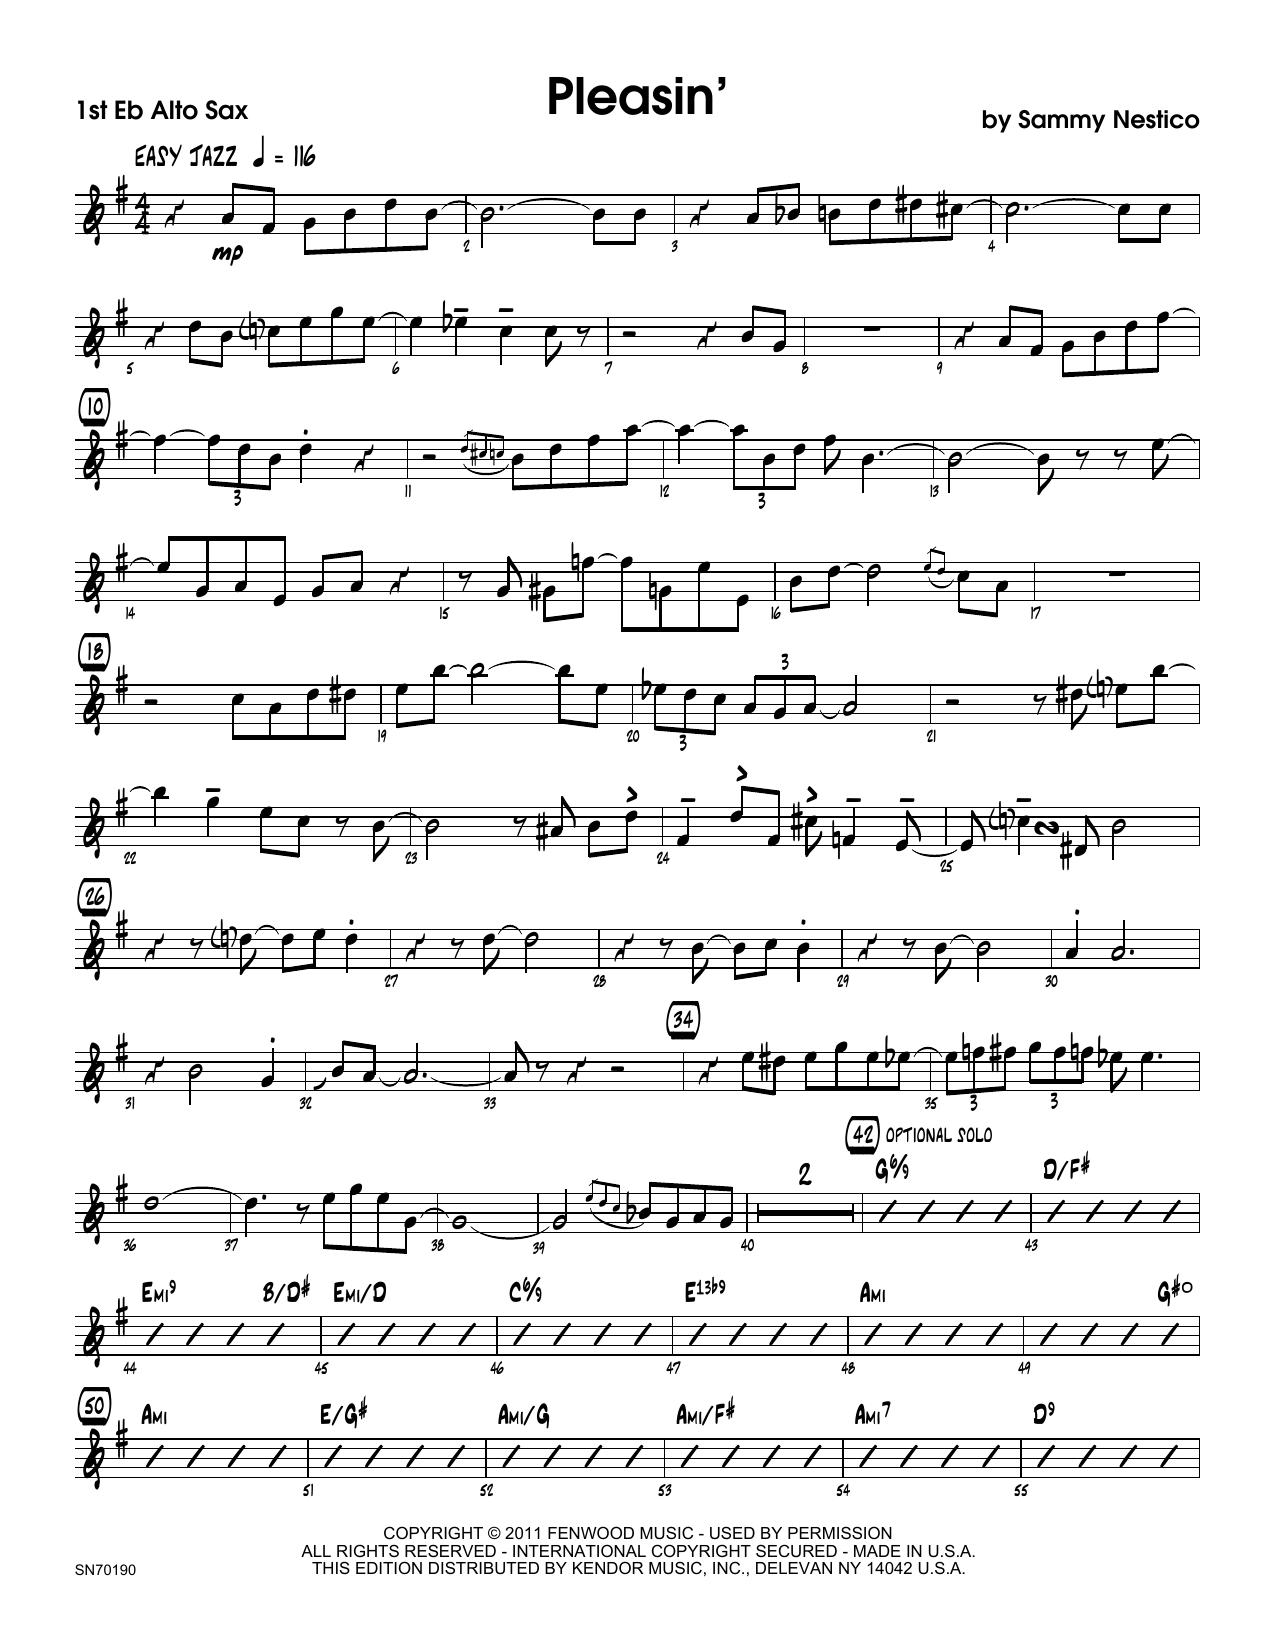 Pleasin' - 1st Eb Alto Saxophone